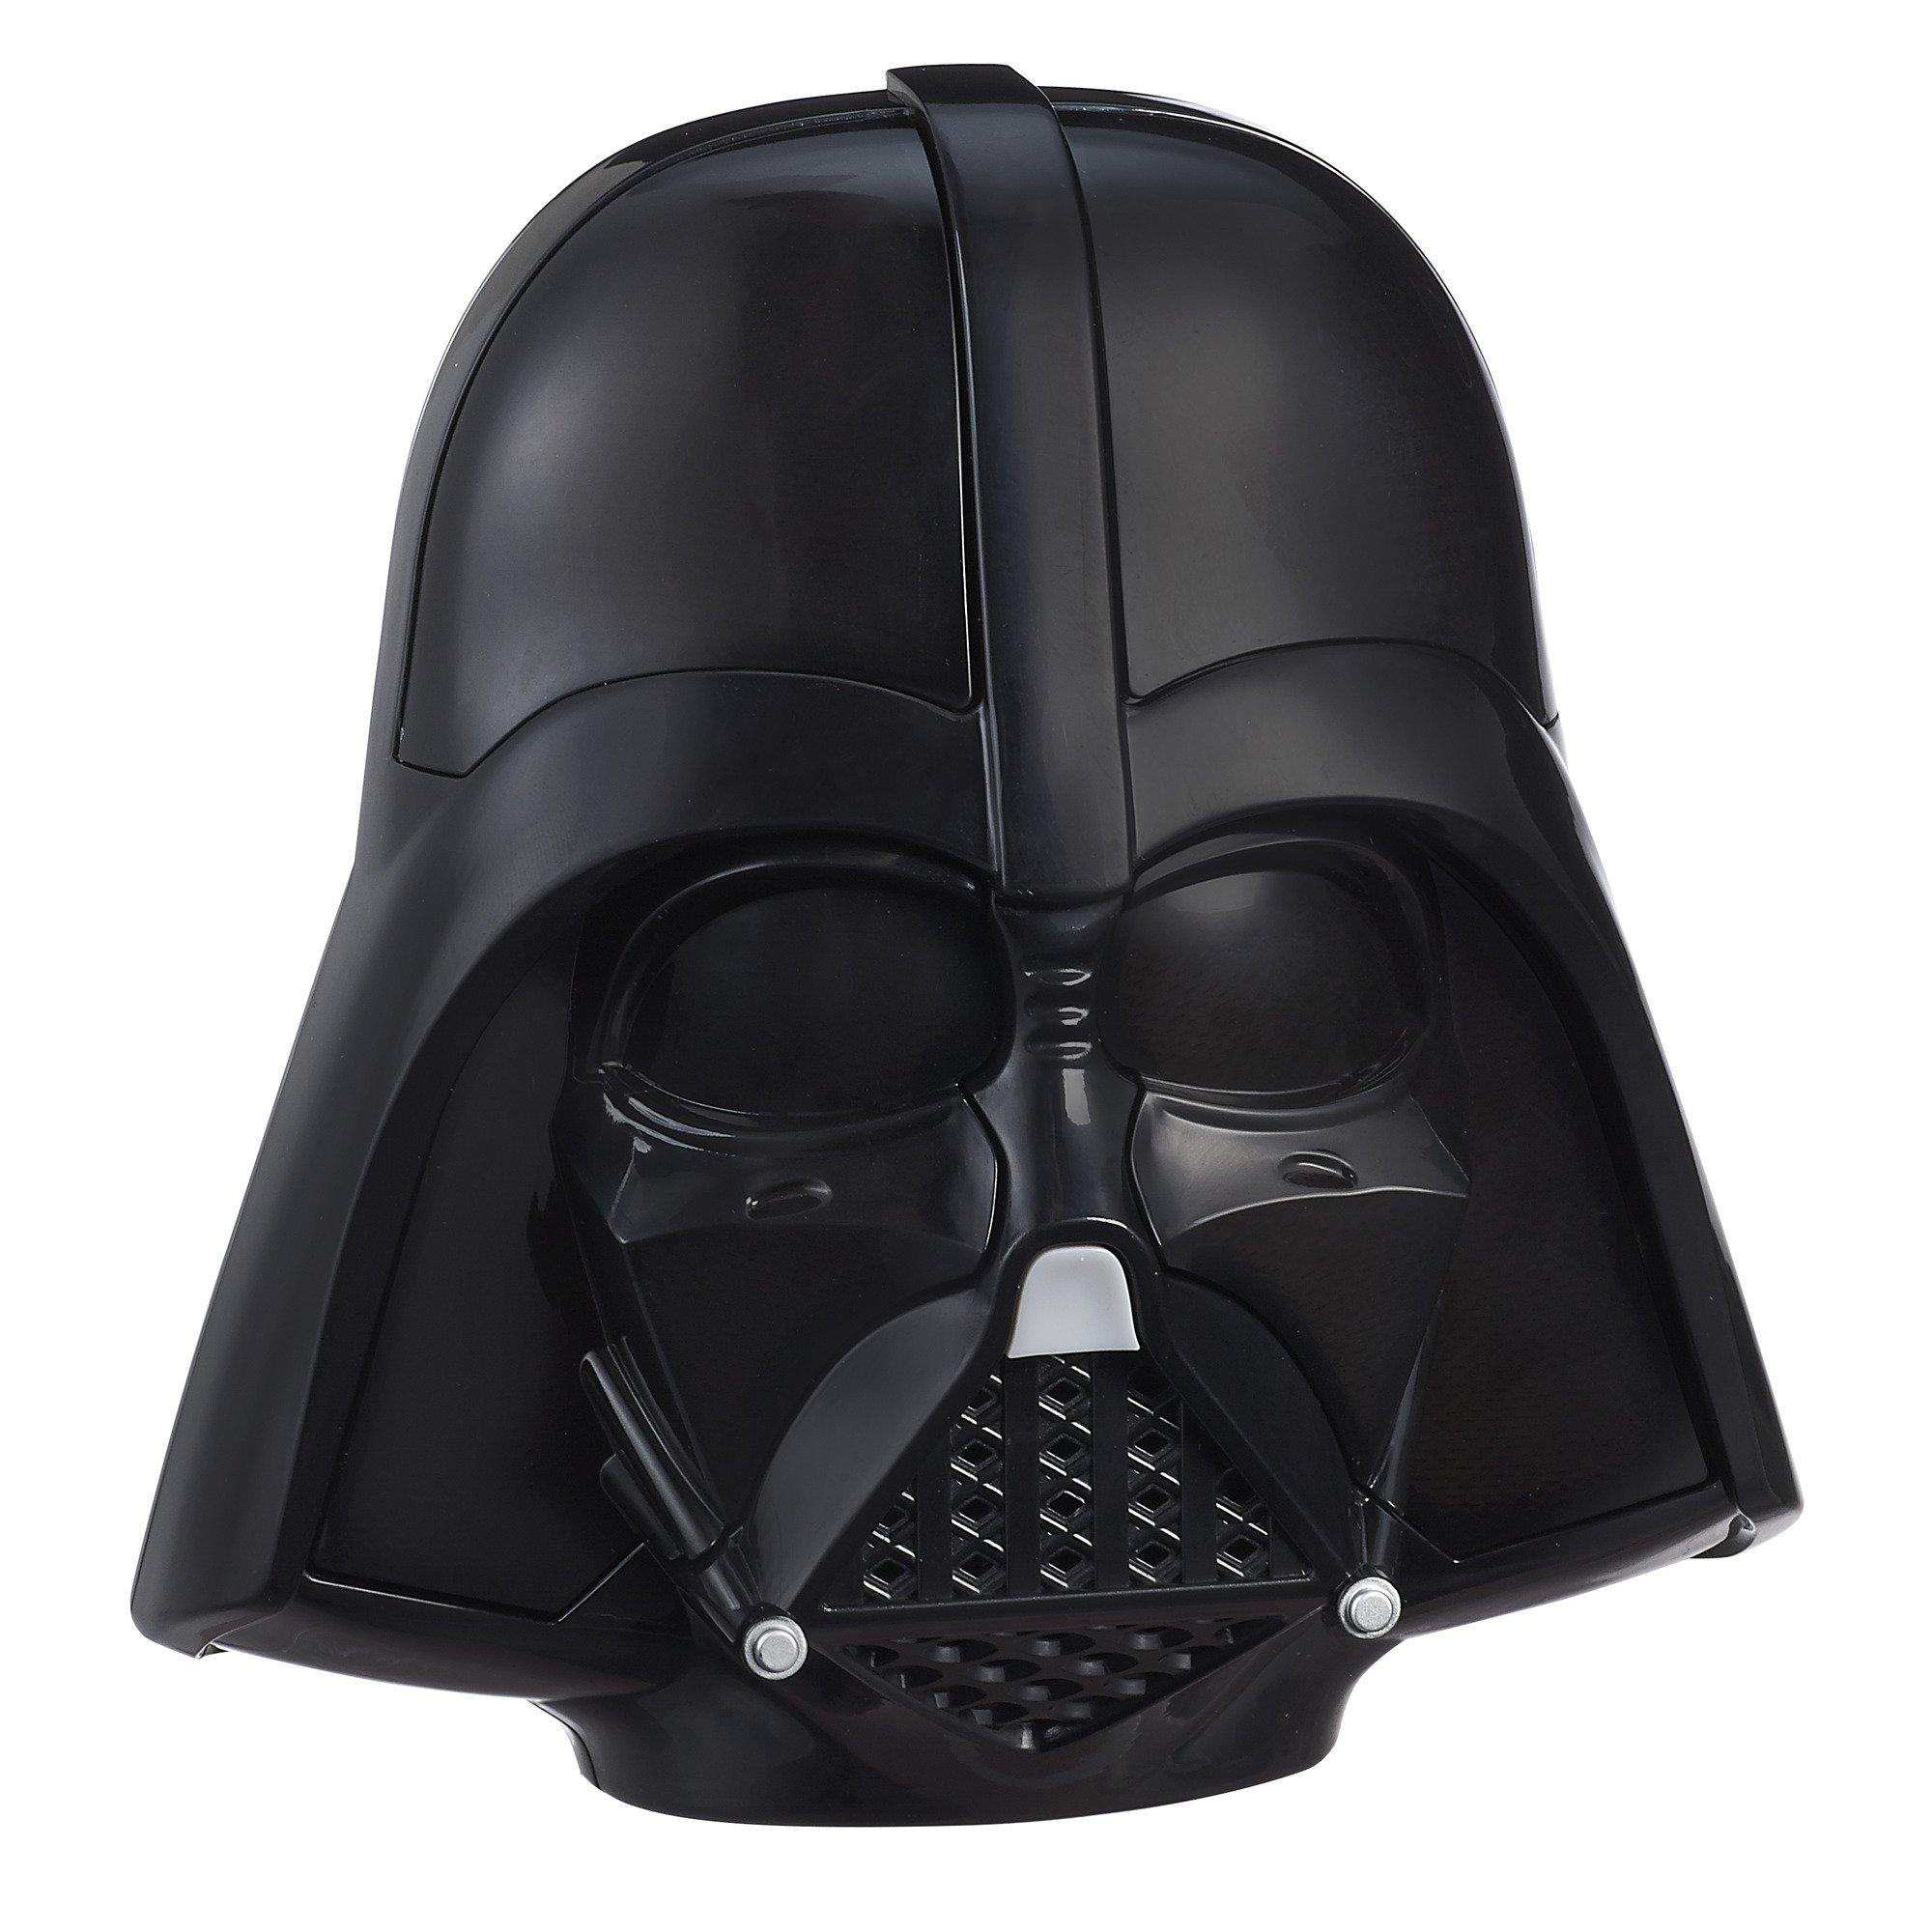 Hasbro Simon Star Wars Darth Vader Game